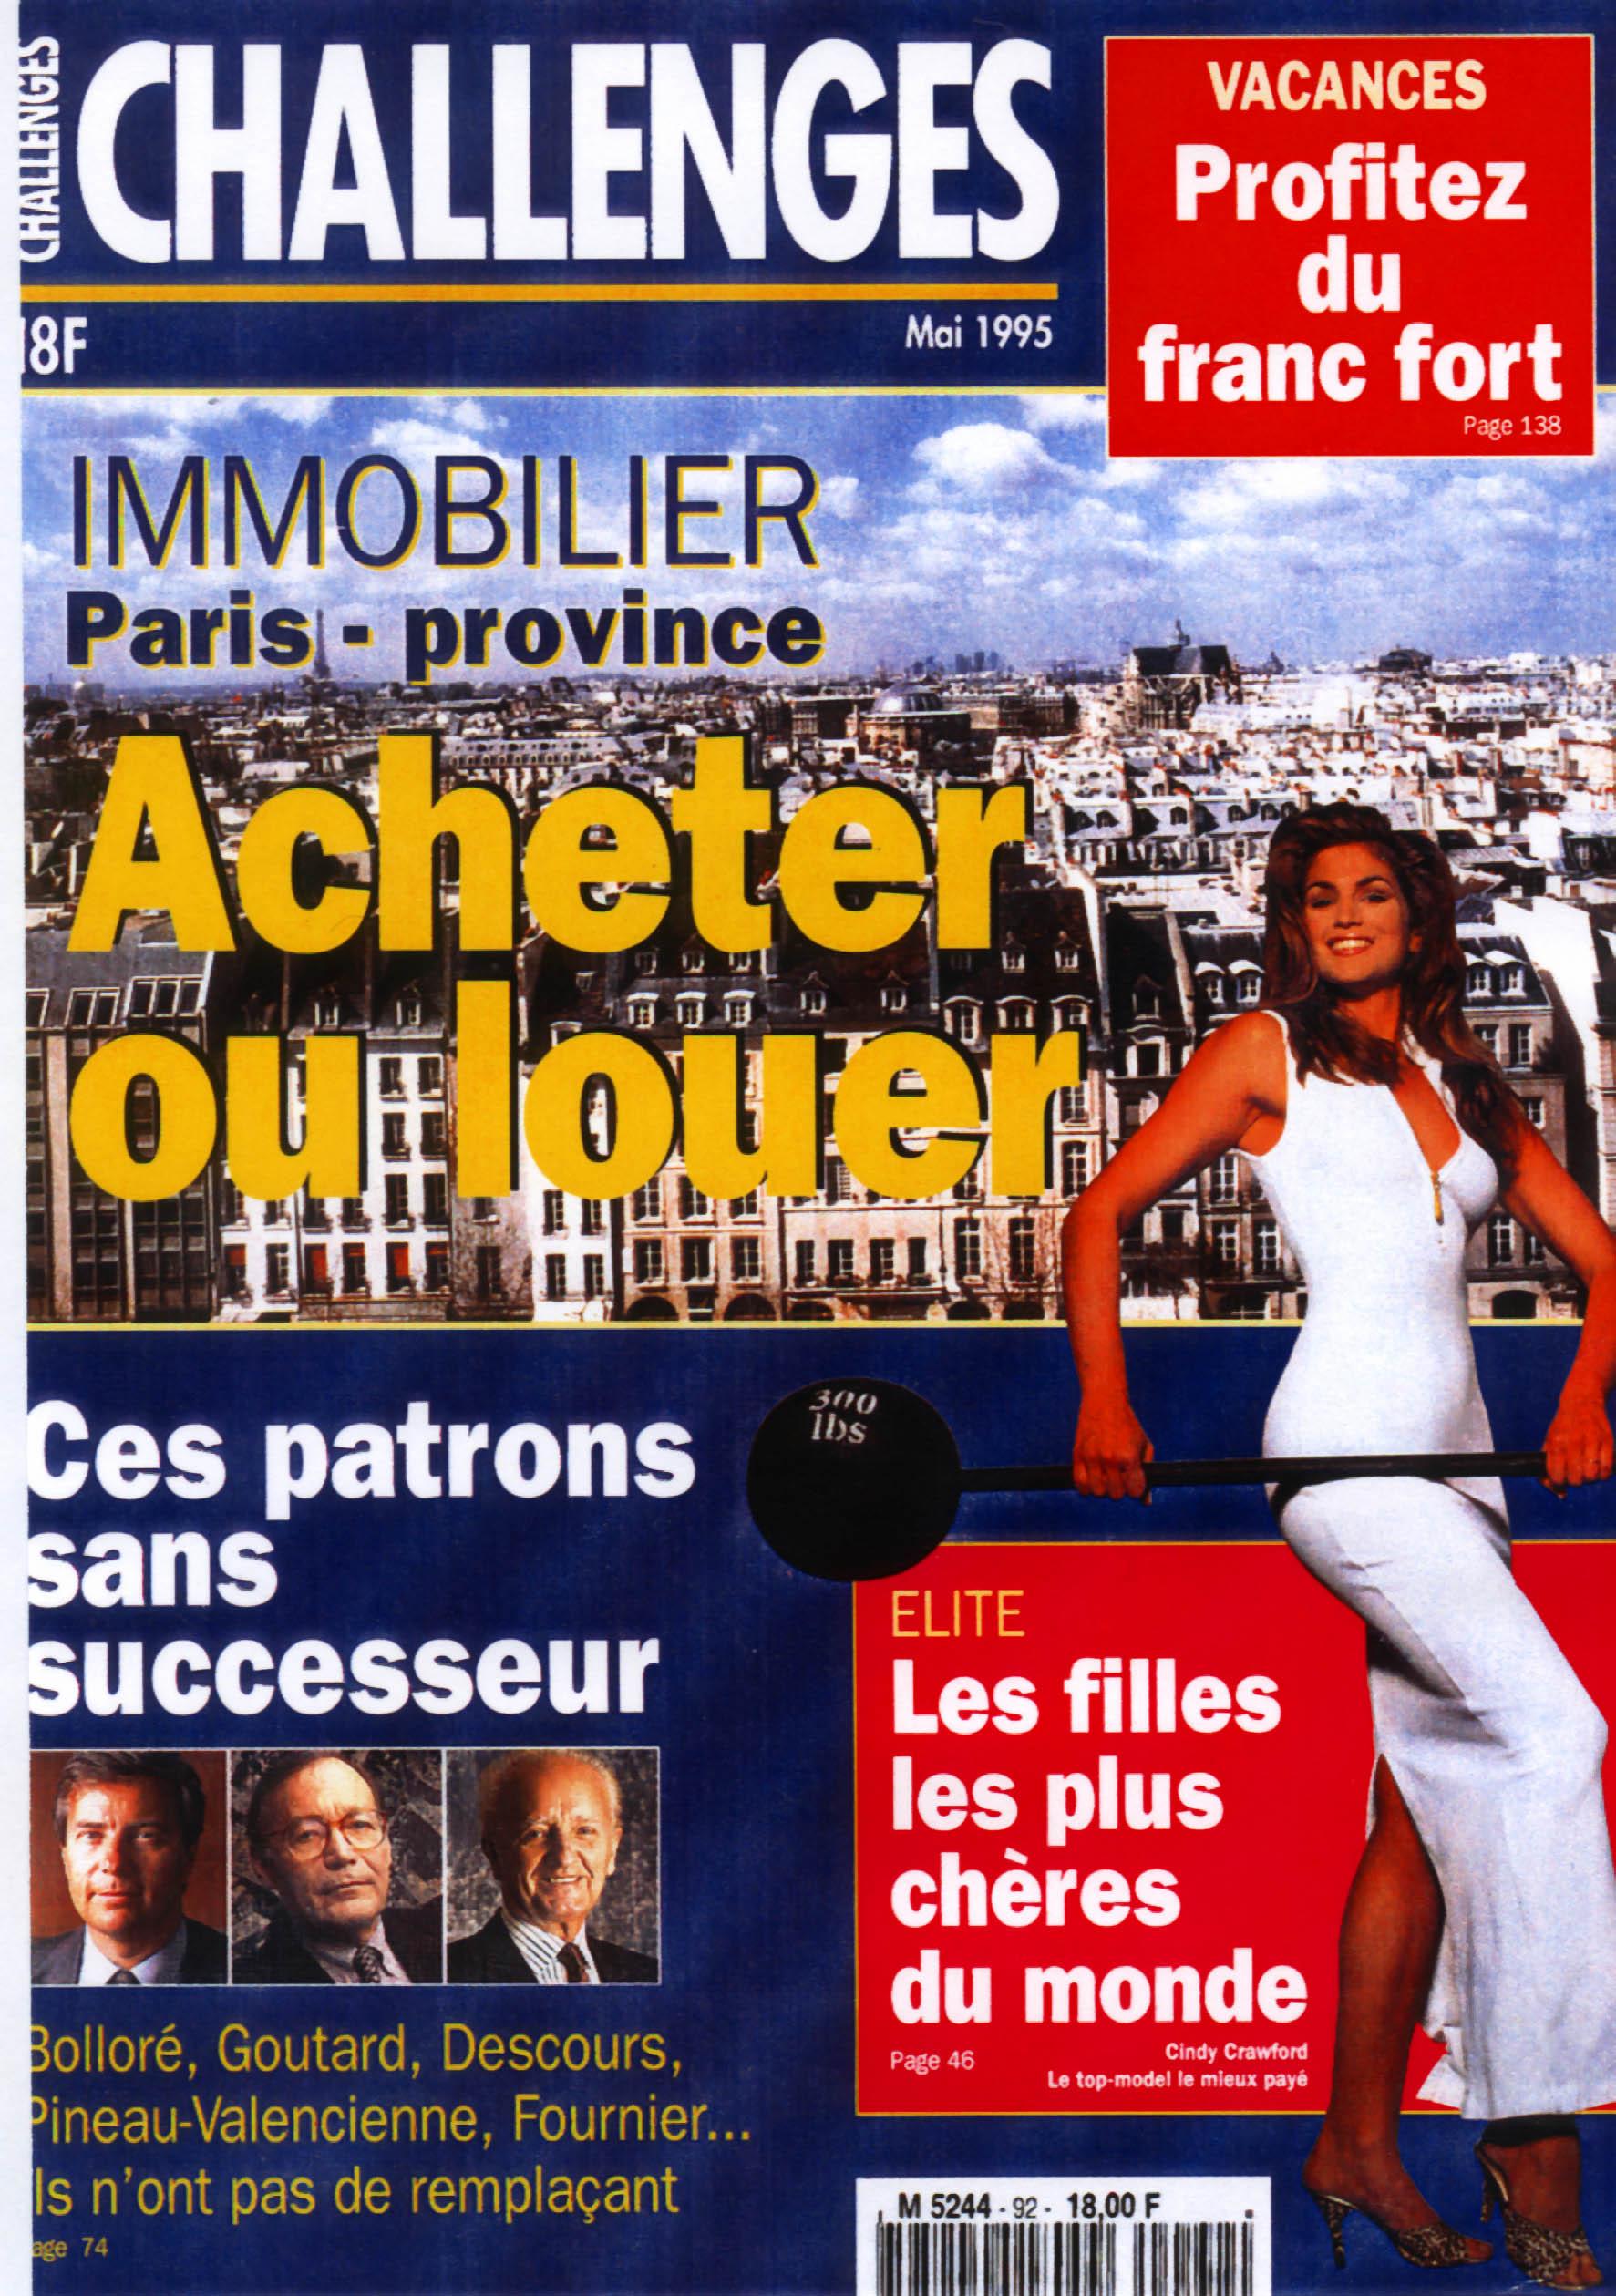 1995 Challenges-Mai95-Couve.jpg